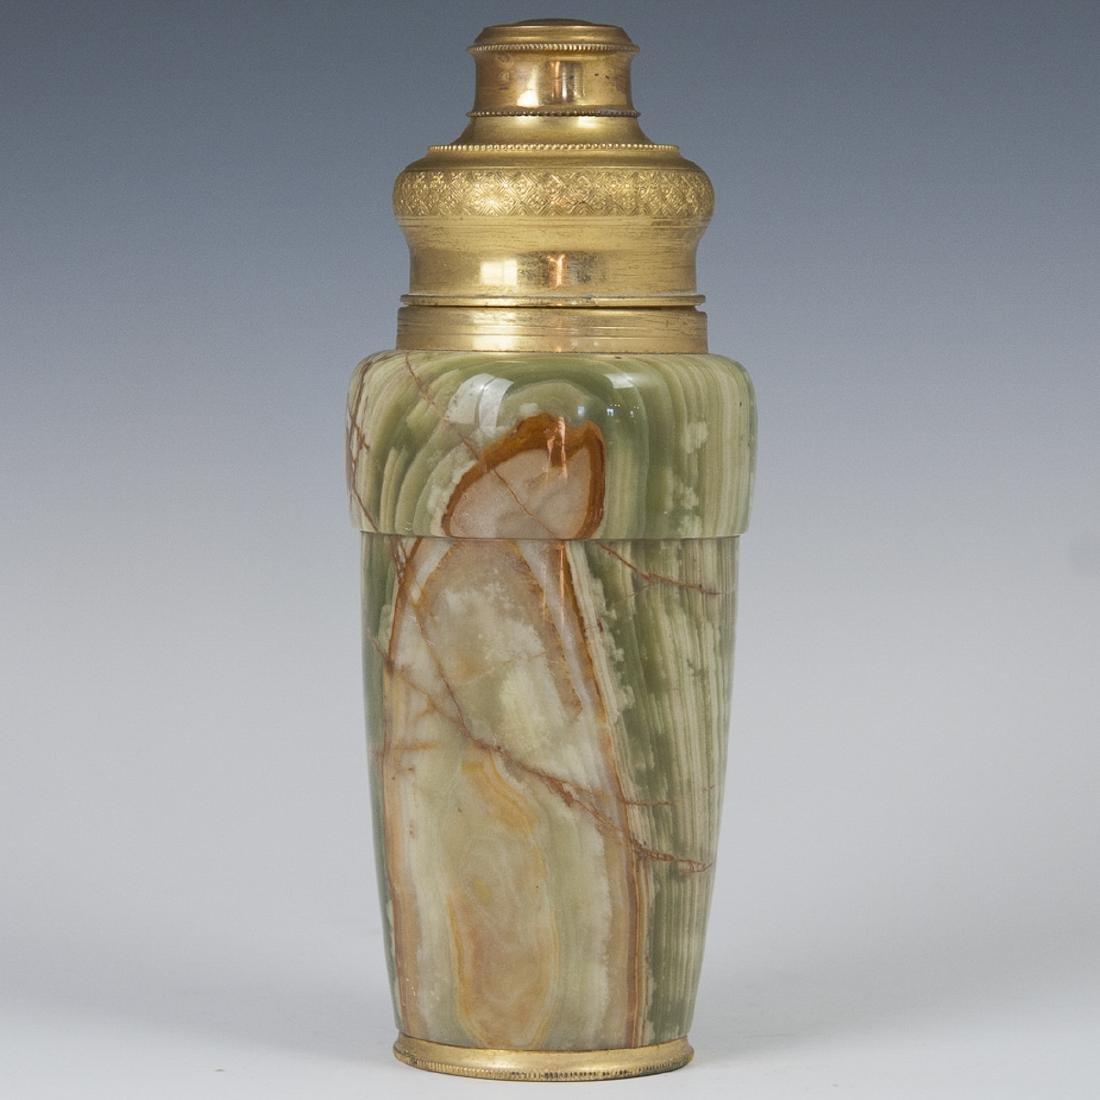 Vintage Gilded & Onyx Cocktail Shaker